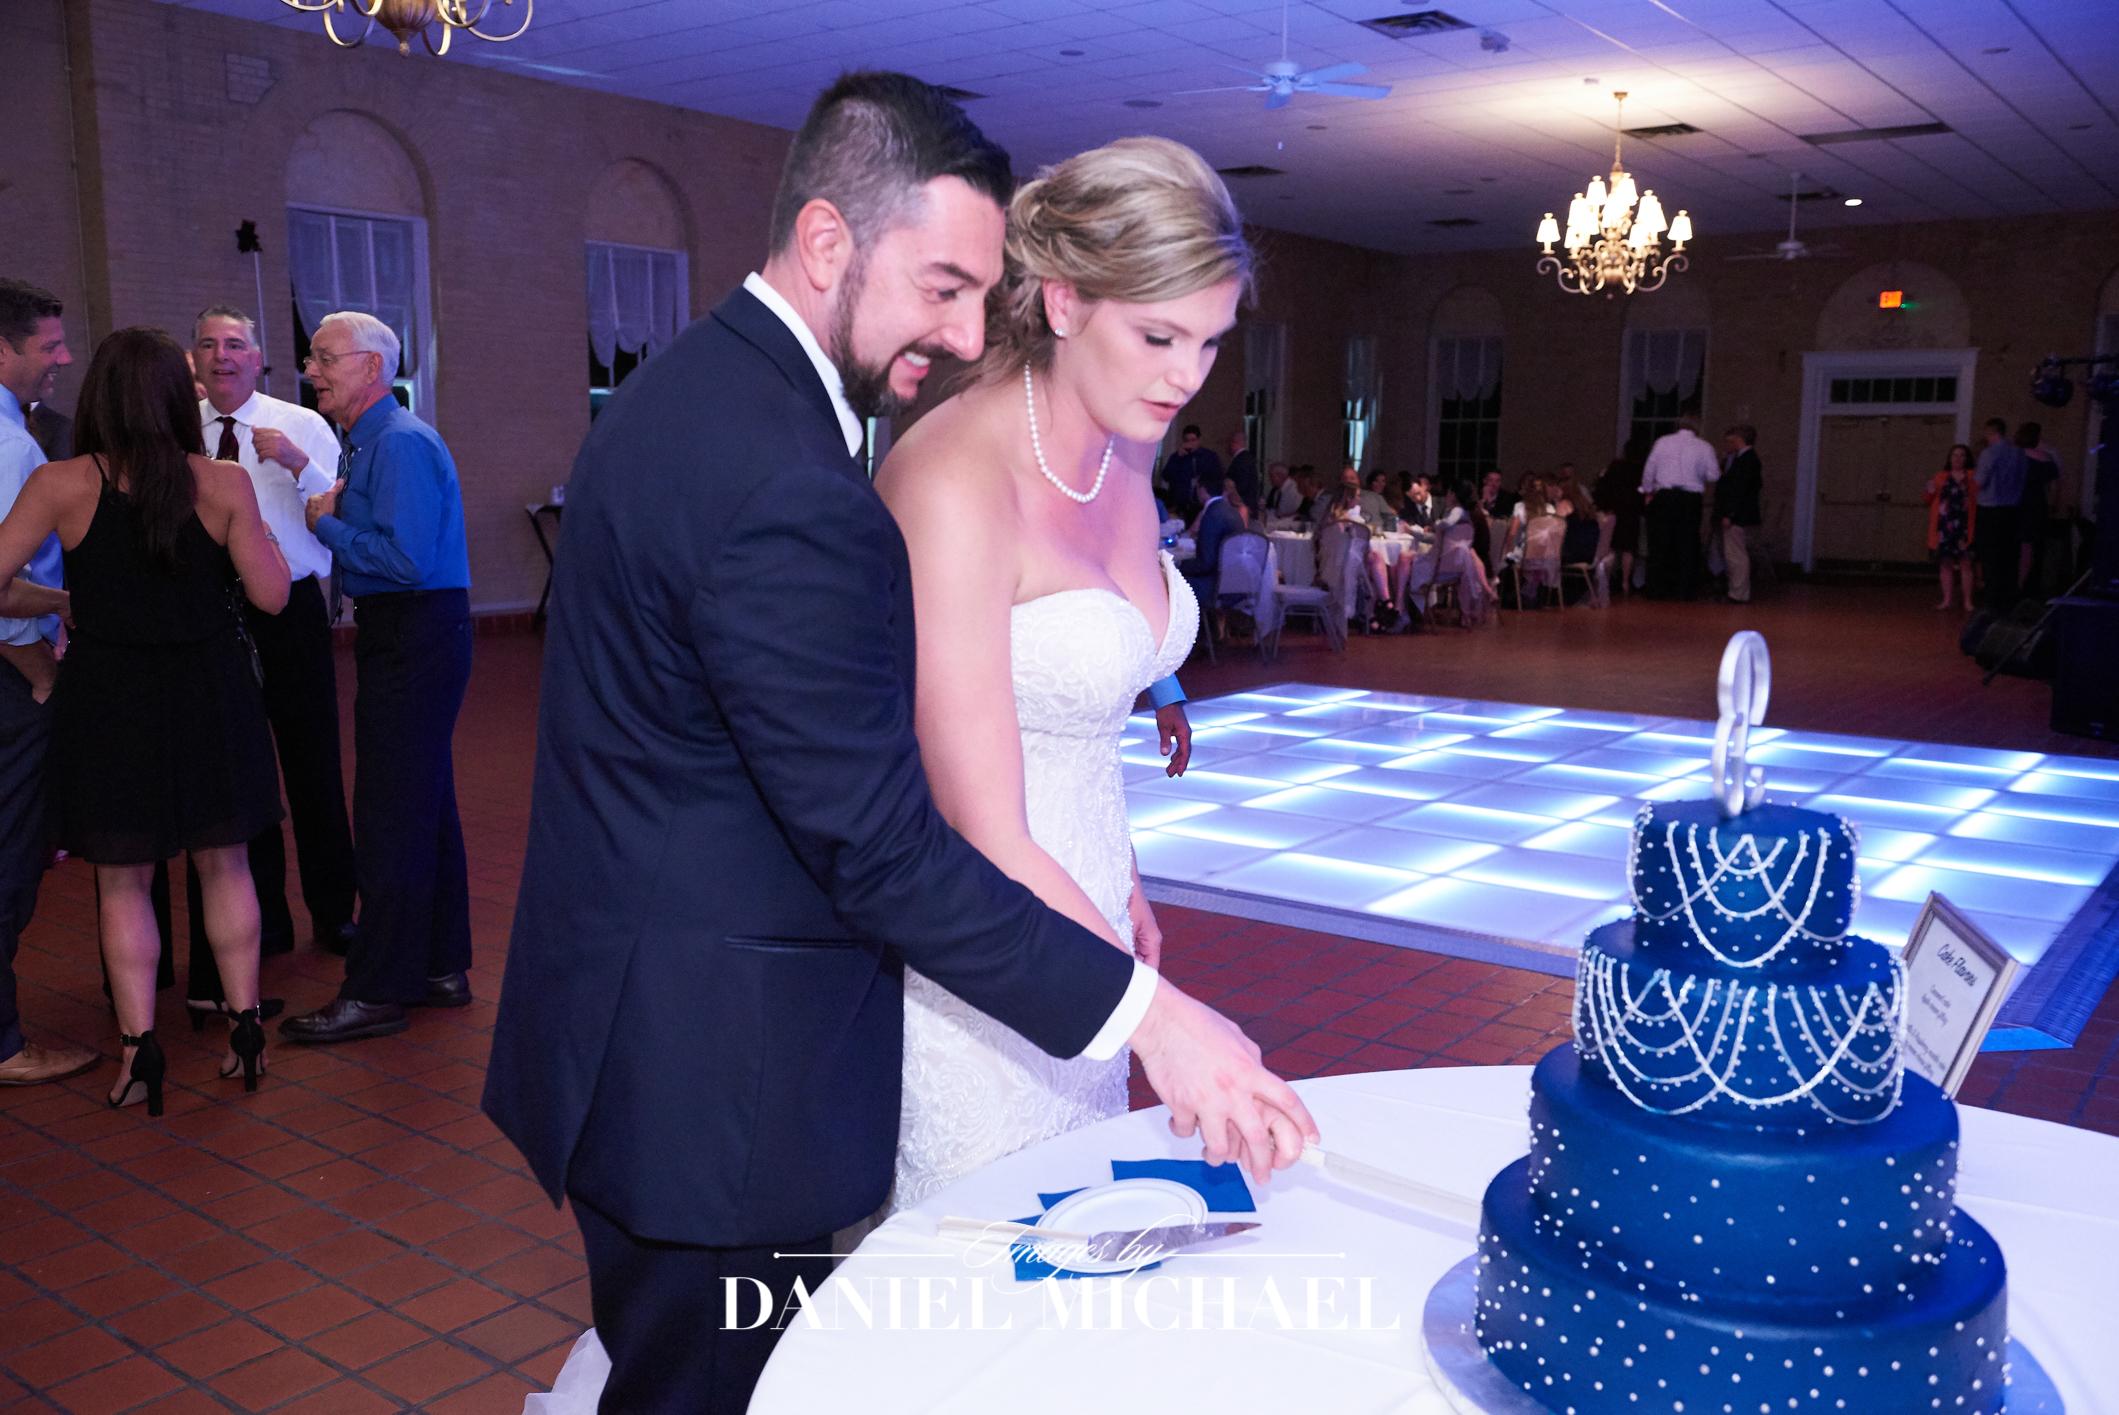 Fort Thomas Ft. Venue Reception Wedding Photographer